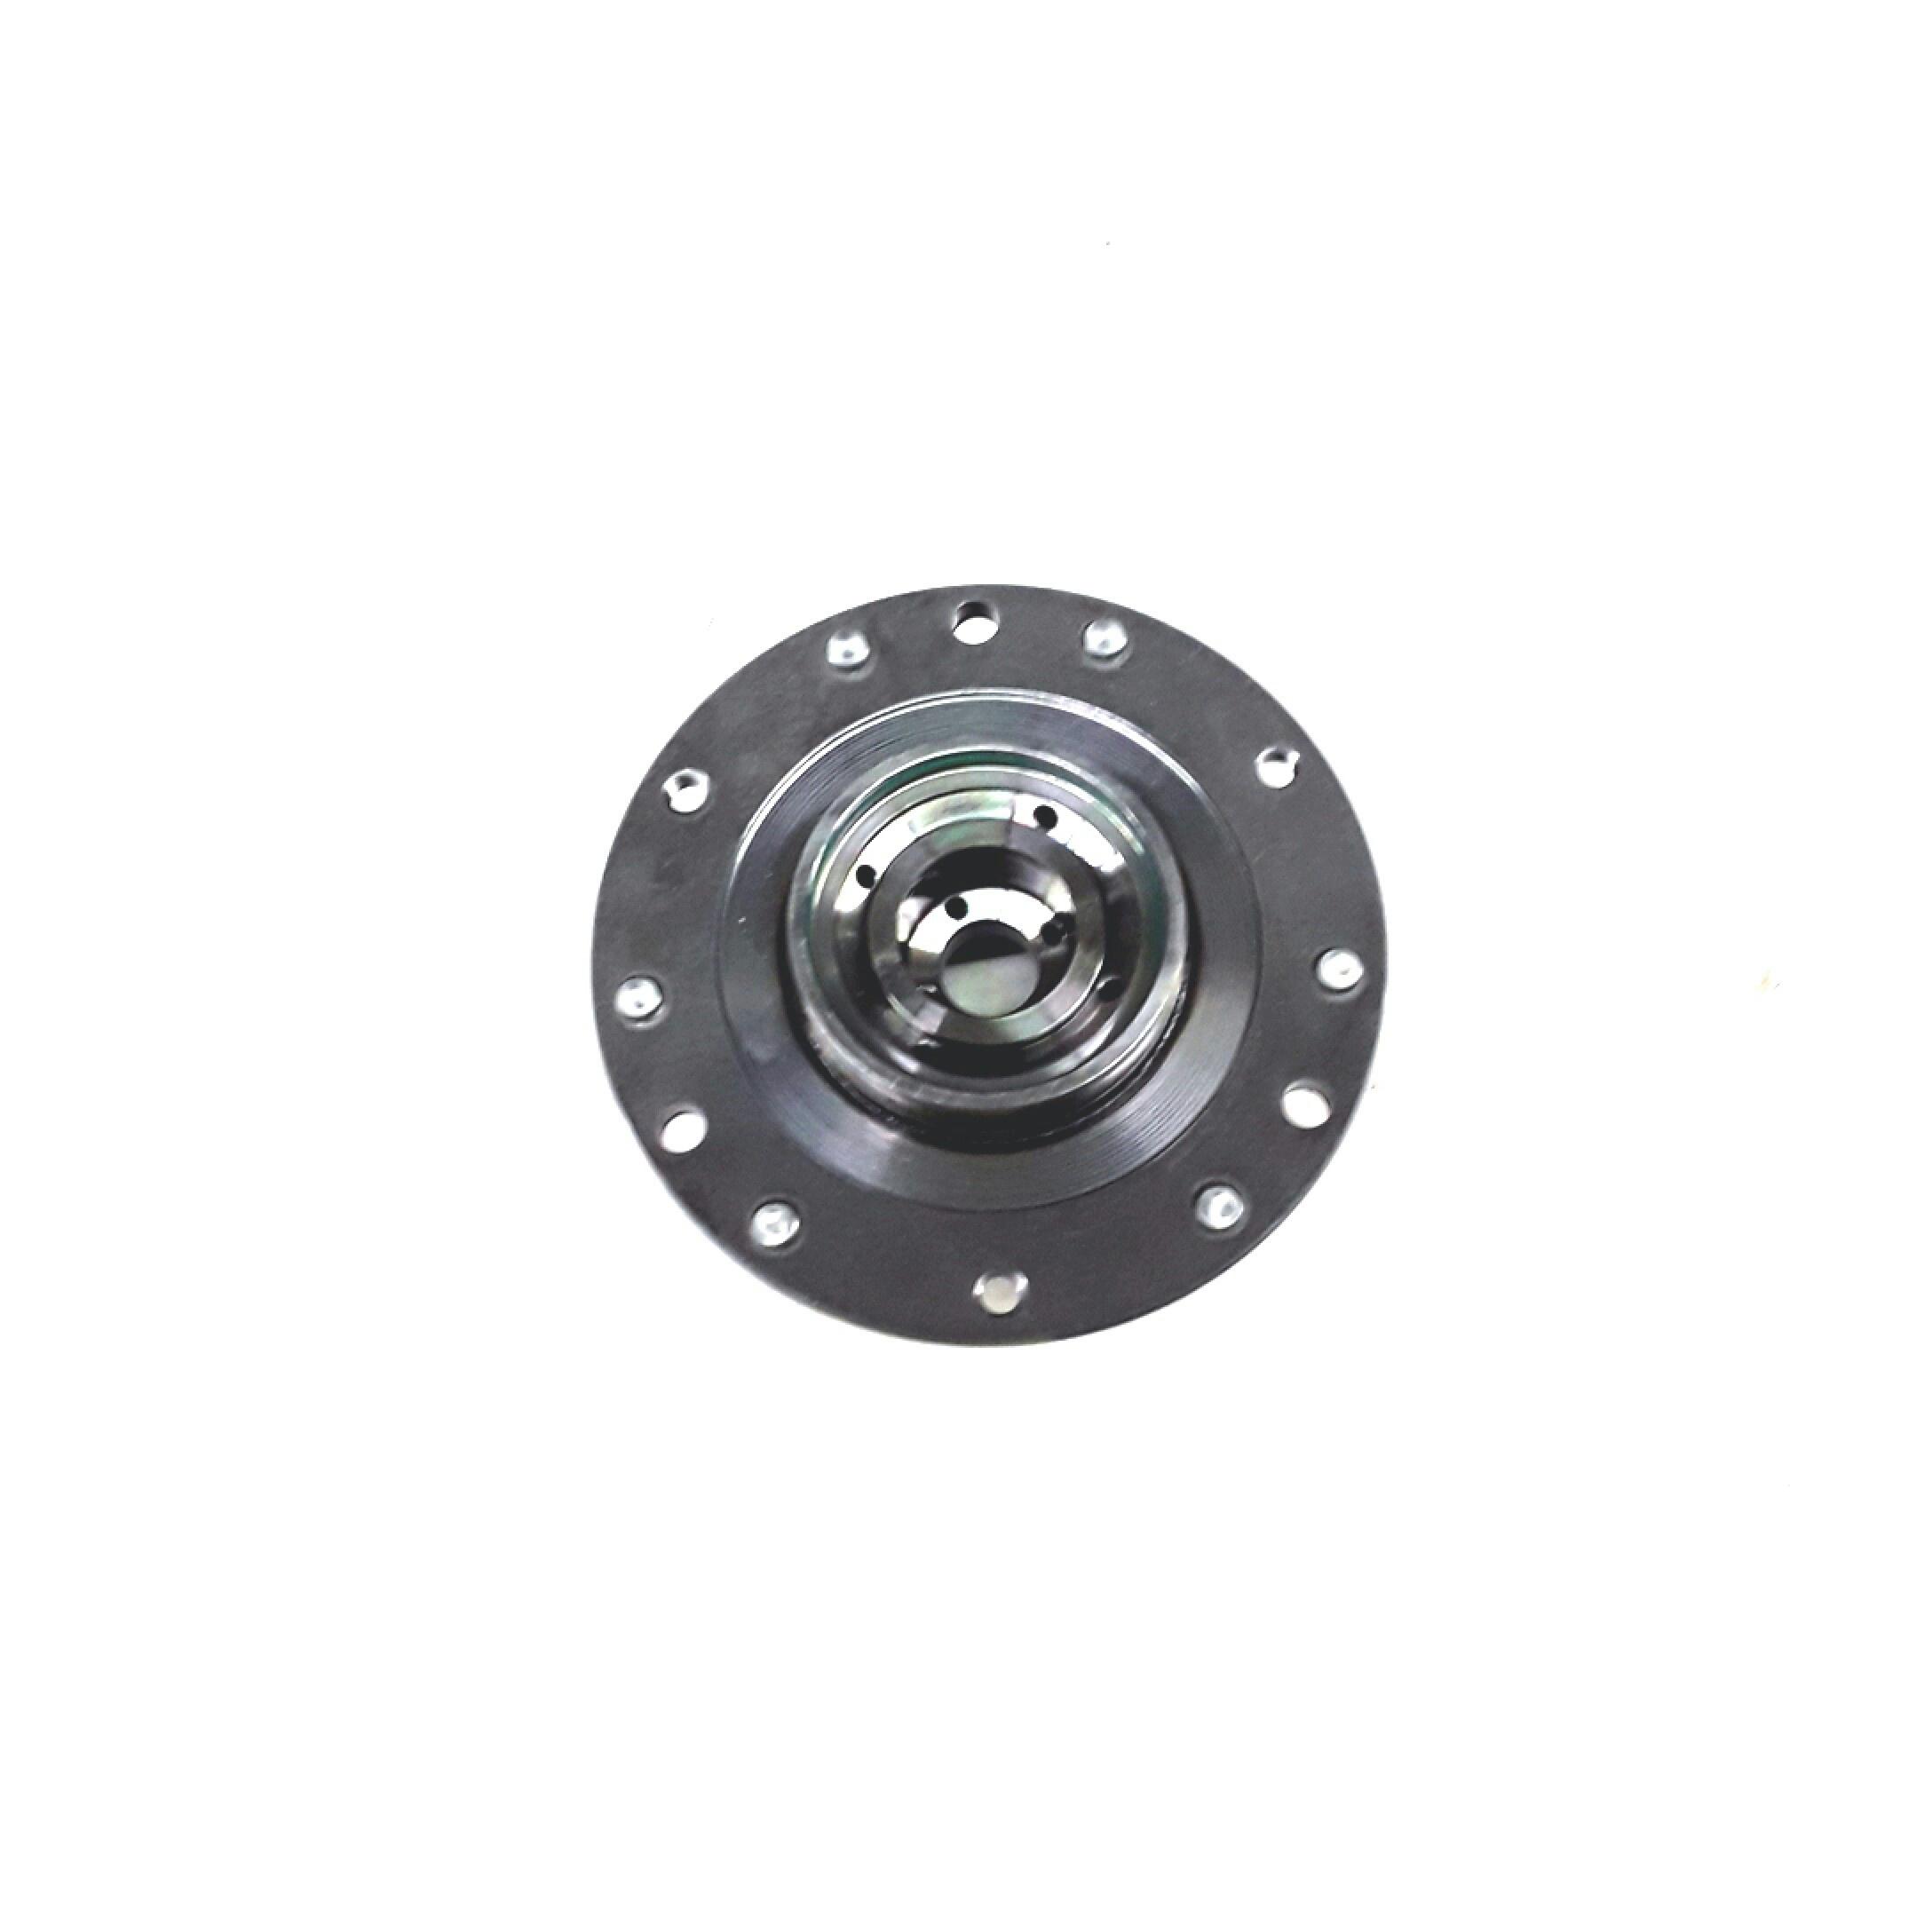 Volvo Parts: 9497786 - Volvo Pulley. VVT